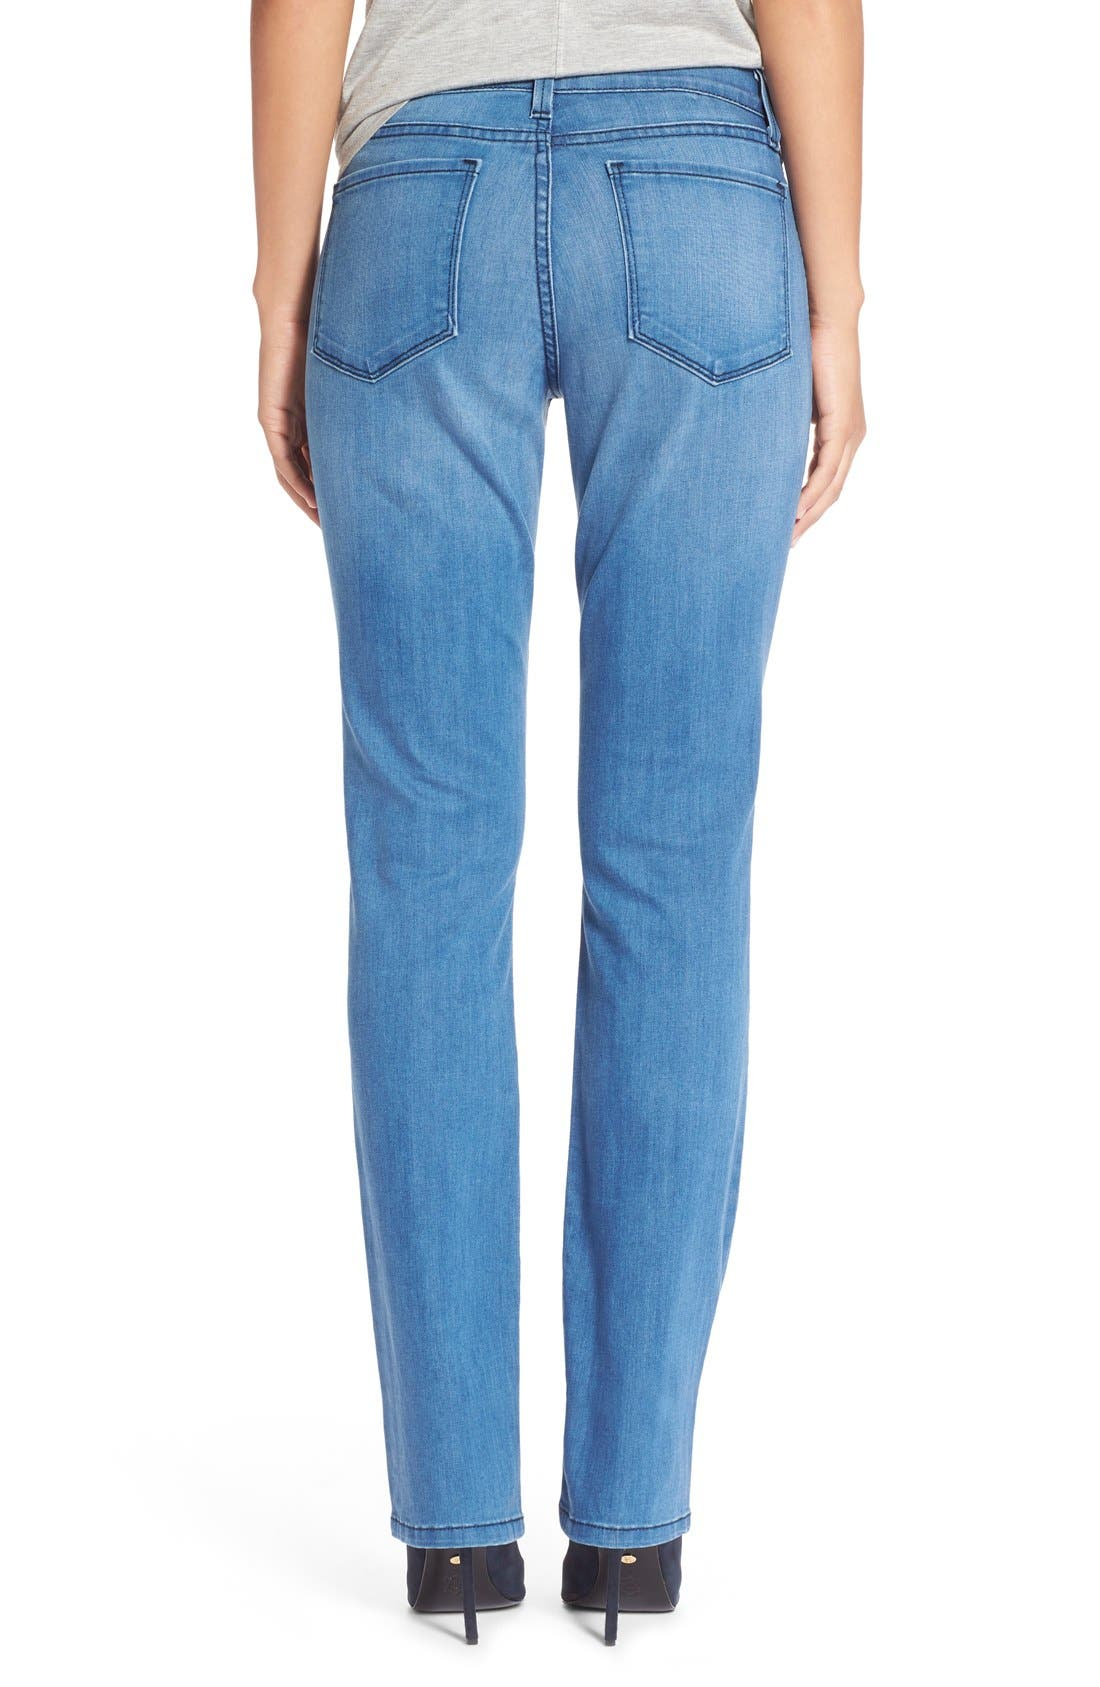 Alternate Image 2  - NYDJ 'Sheri' Stretch Skinny Jeans (Newberry)